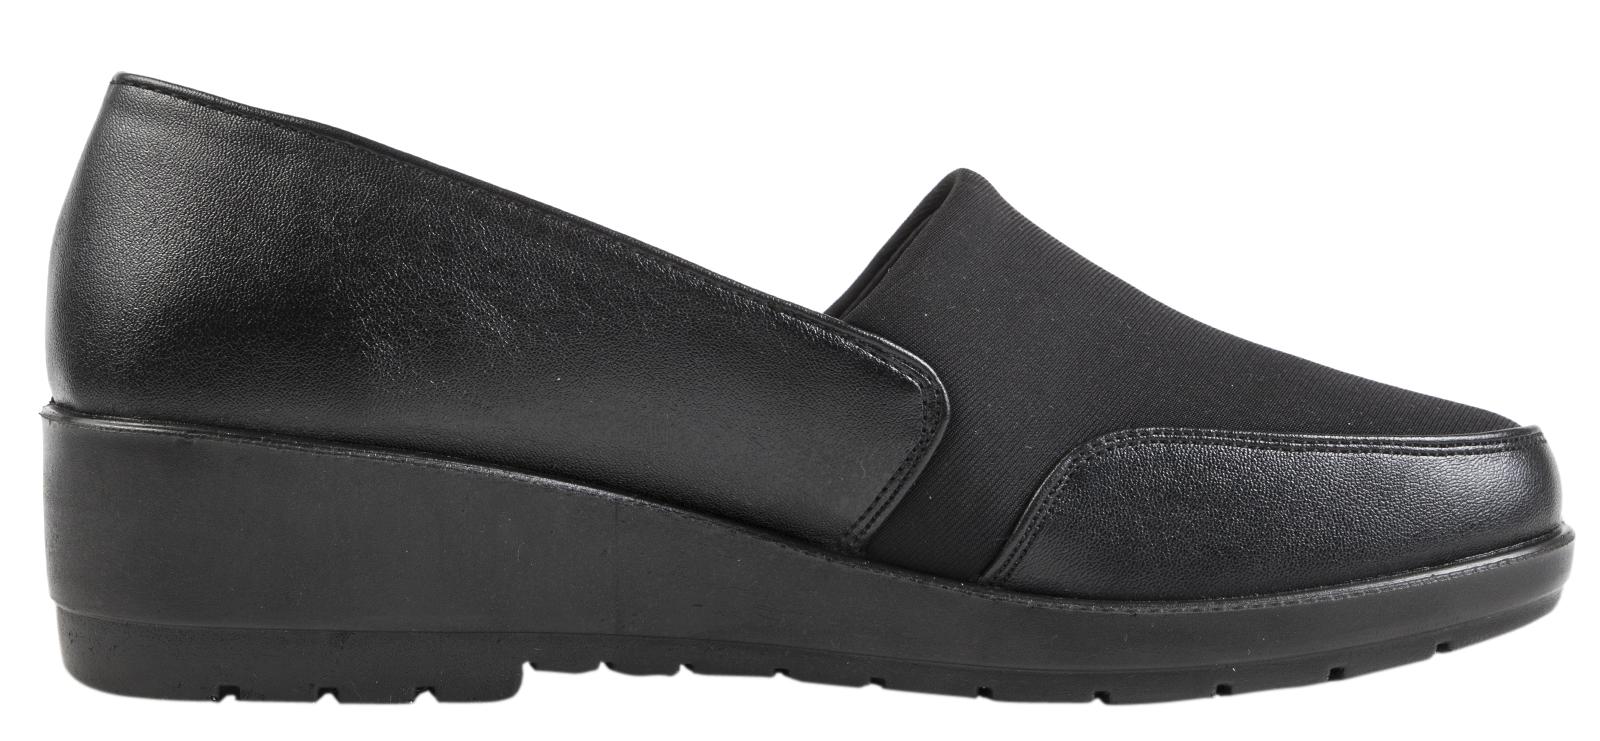 Womens Stretch Elastic Work Shoes Flat Memory Foam Comfort Shoes Ladies Size